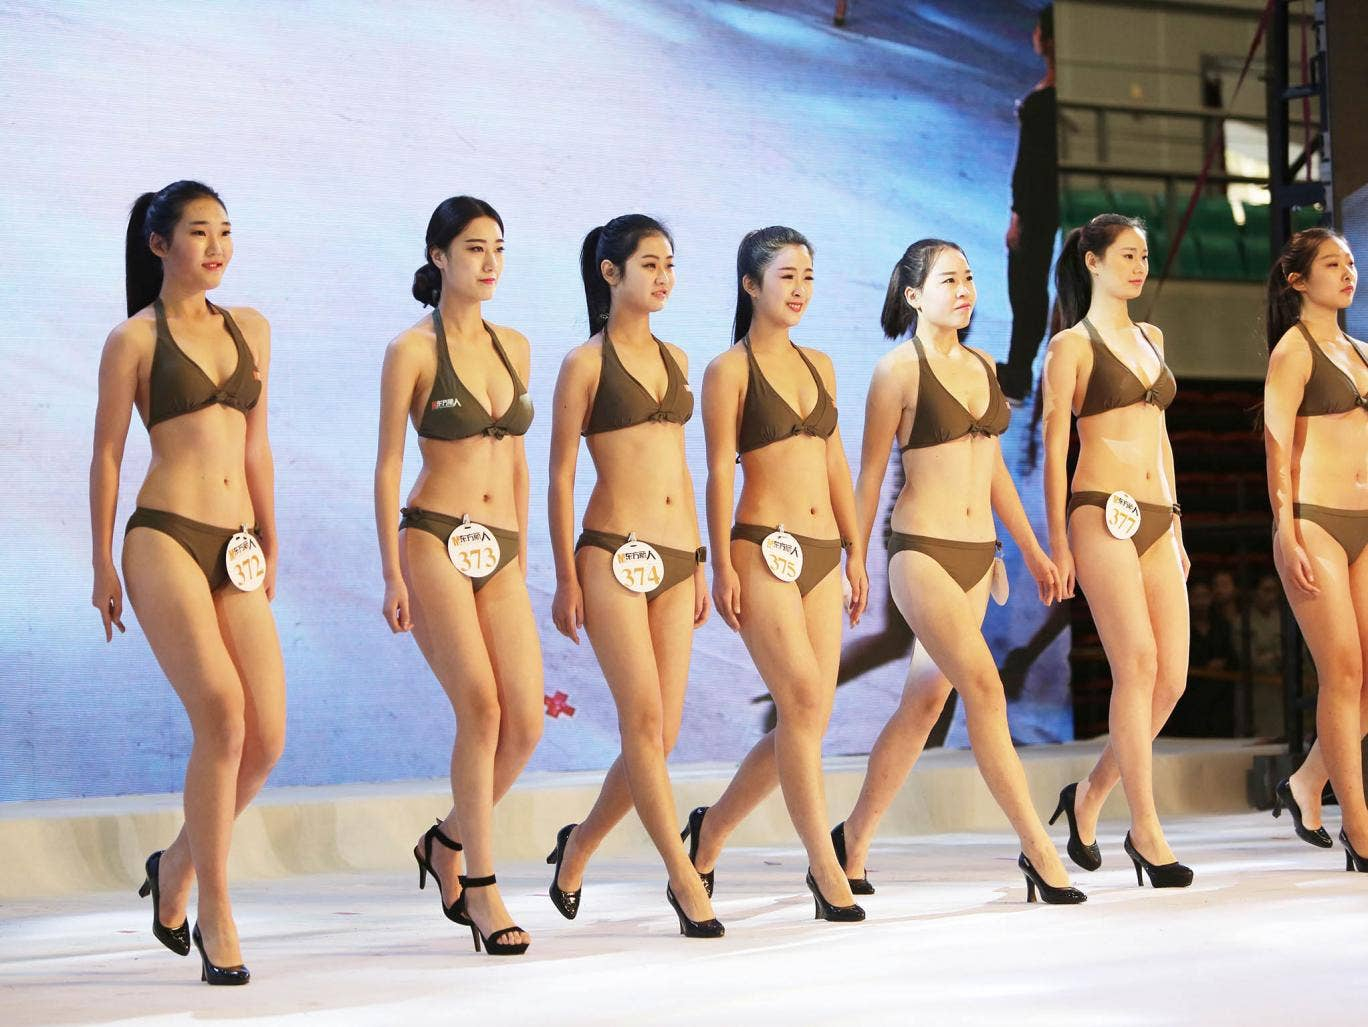 Model and flight attendant audition, Qingdao, China - 28 Dec 2015